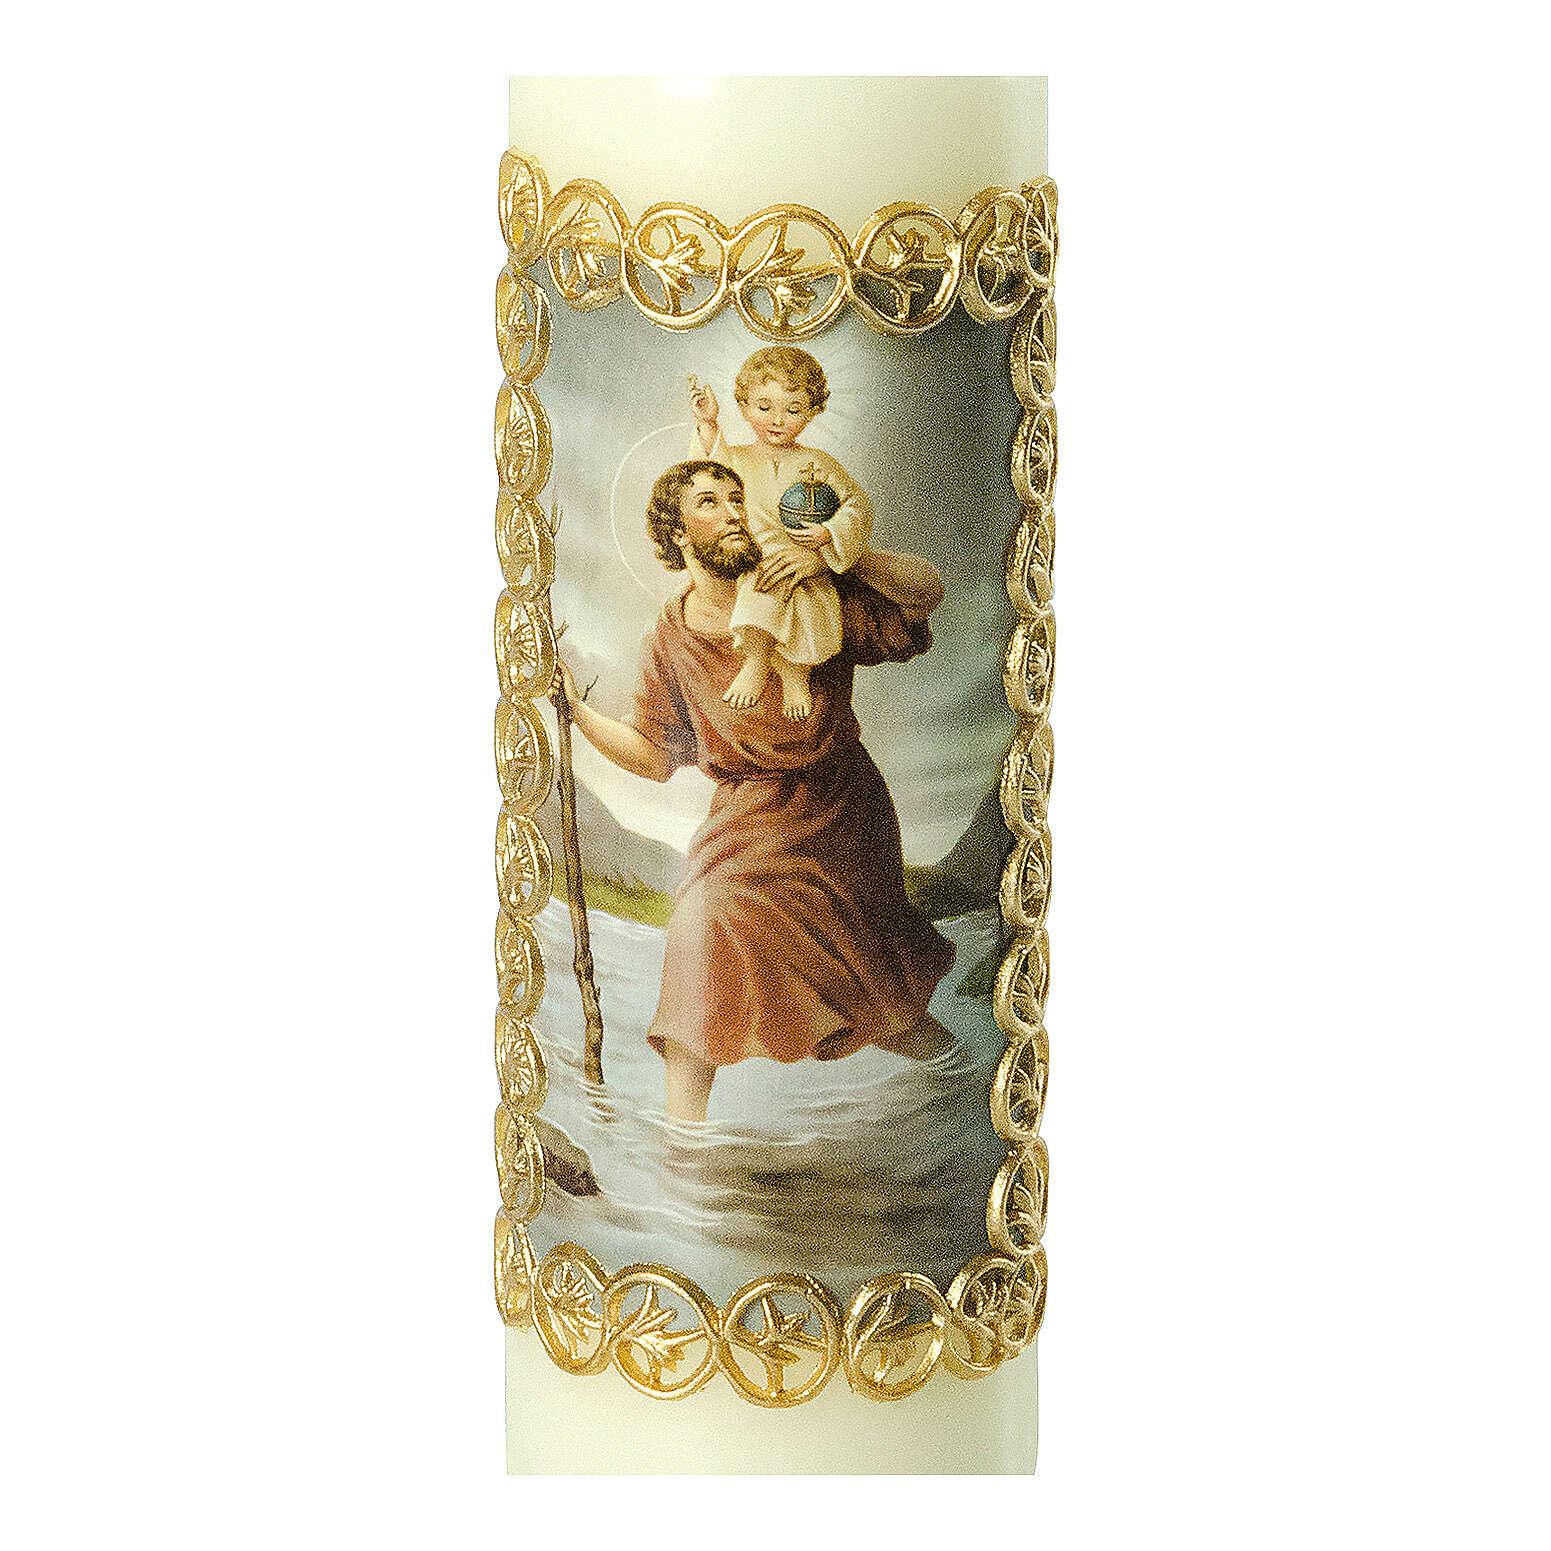 Kerze Heiliger Christophorus mit Jesuskind, 165x50 mm 3